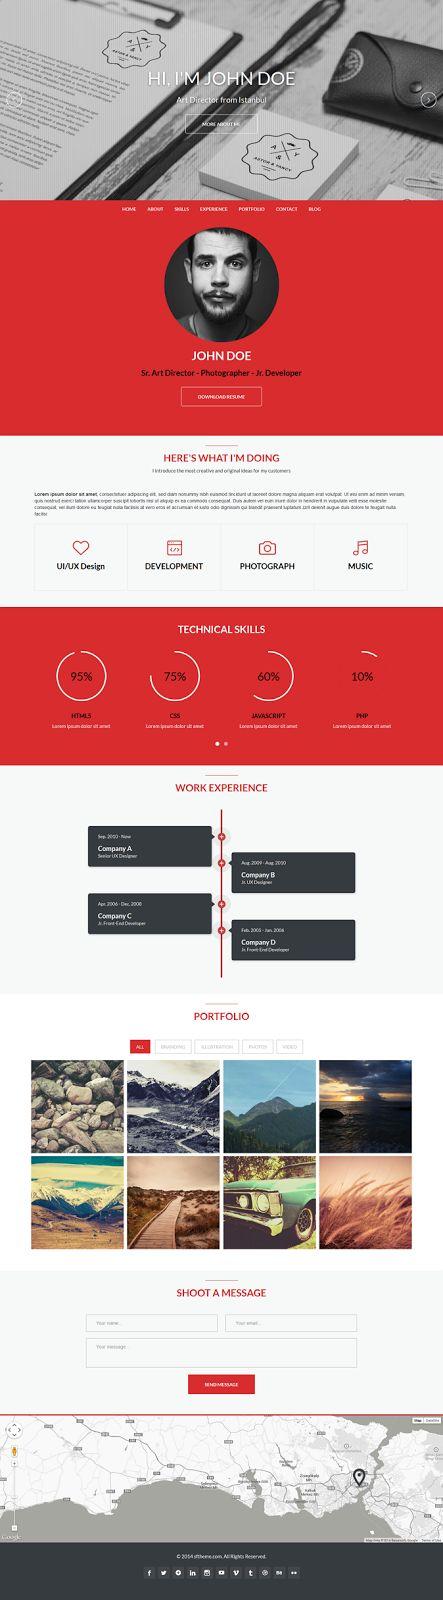 Best  Online Portfolio Examples Ideas On   Graphic